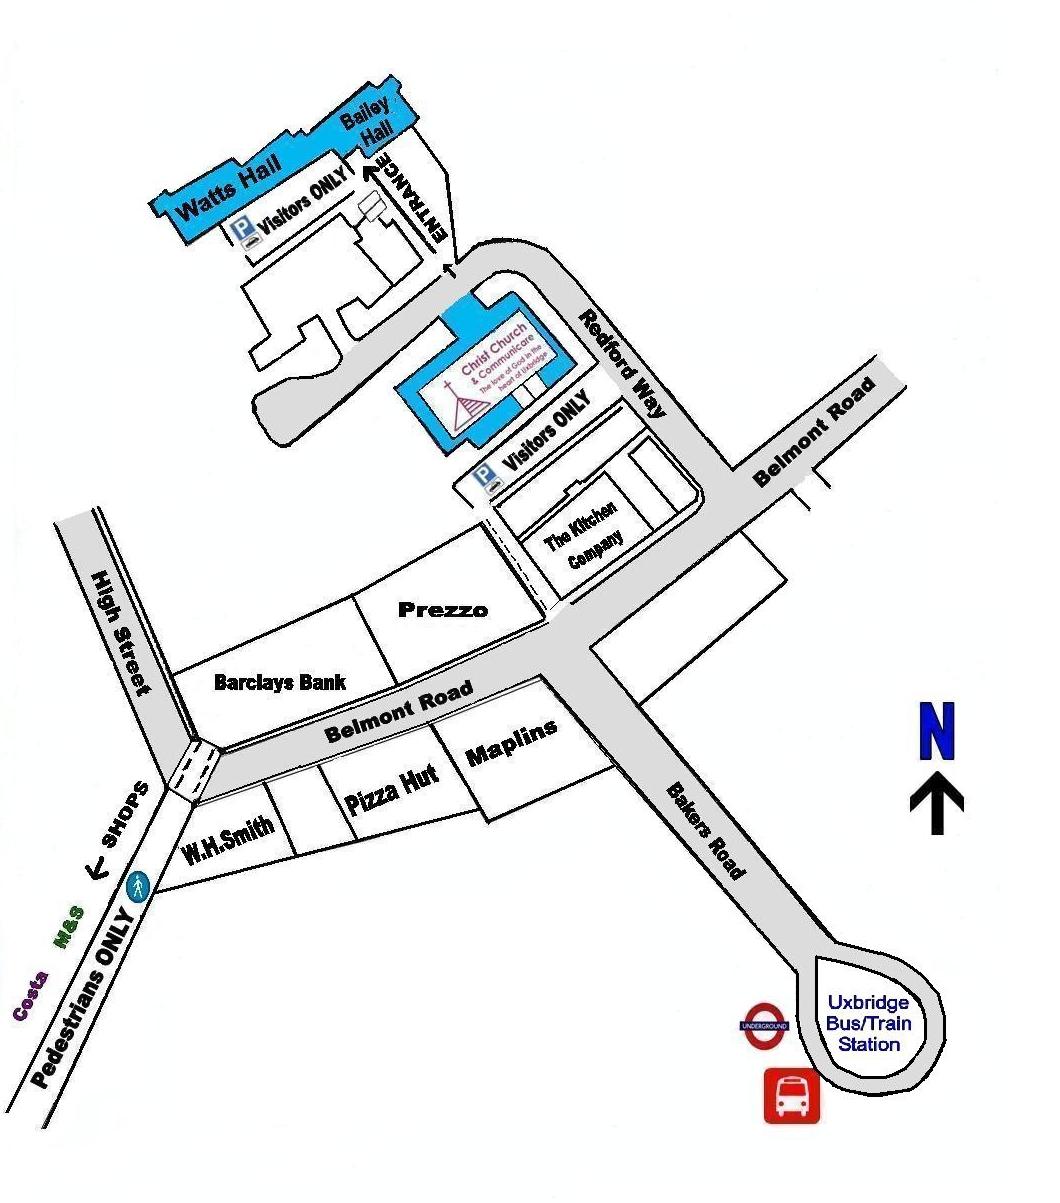 How to find Christ Church, Uxbridge